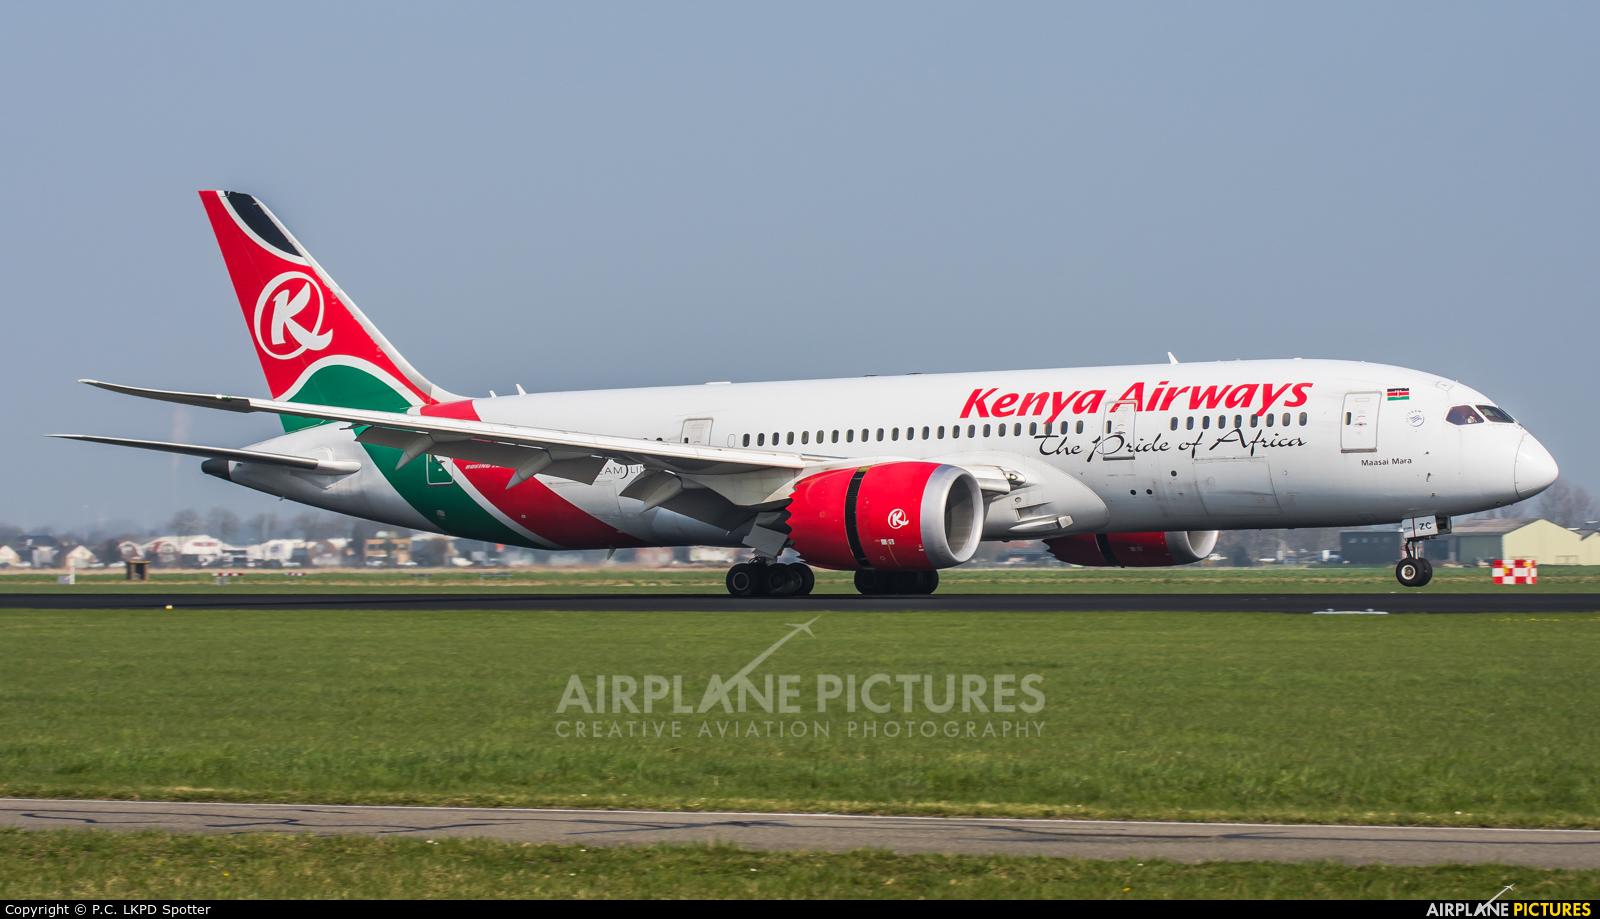 Kenya Airways 5Y-KZC aircraft at Amsterdam - Schiphol